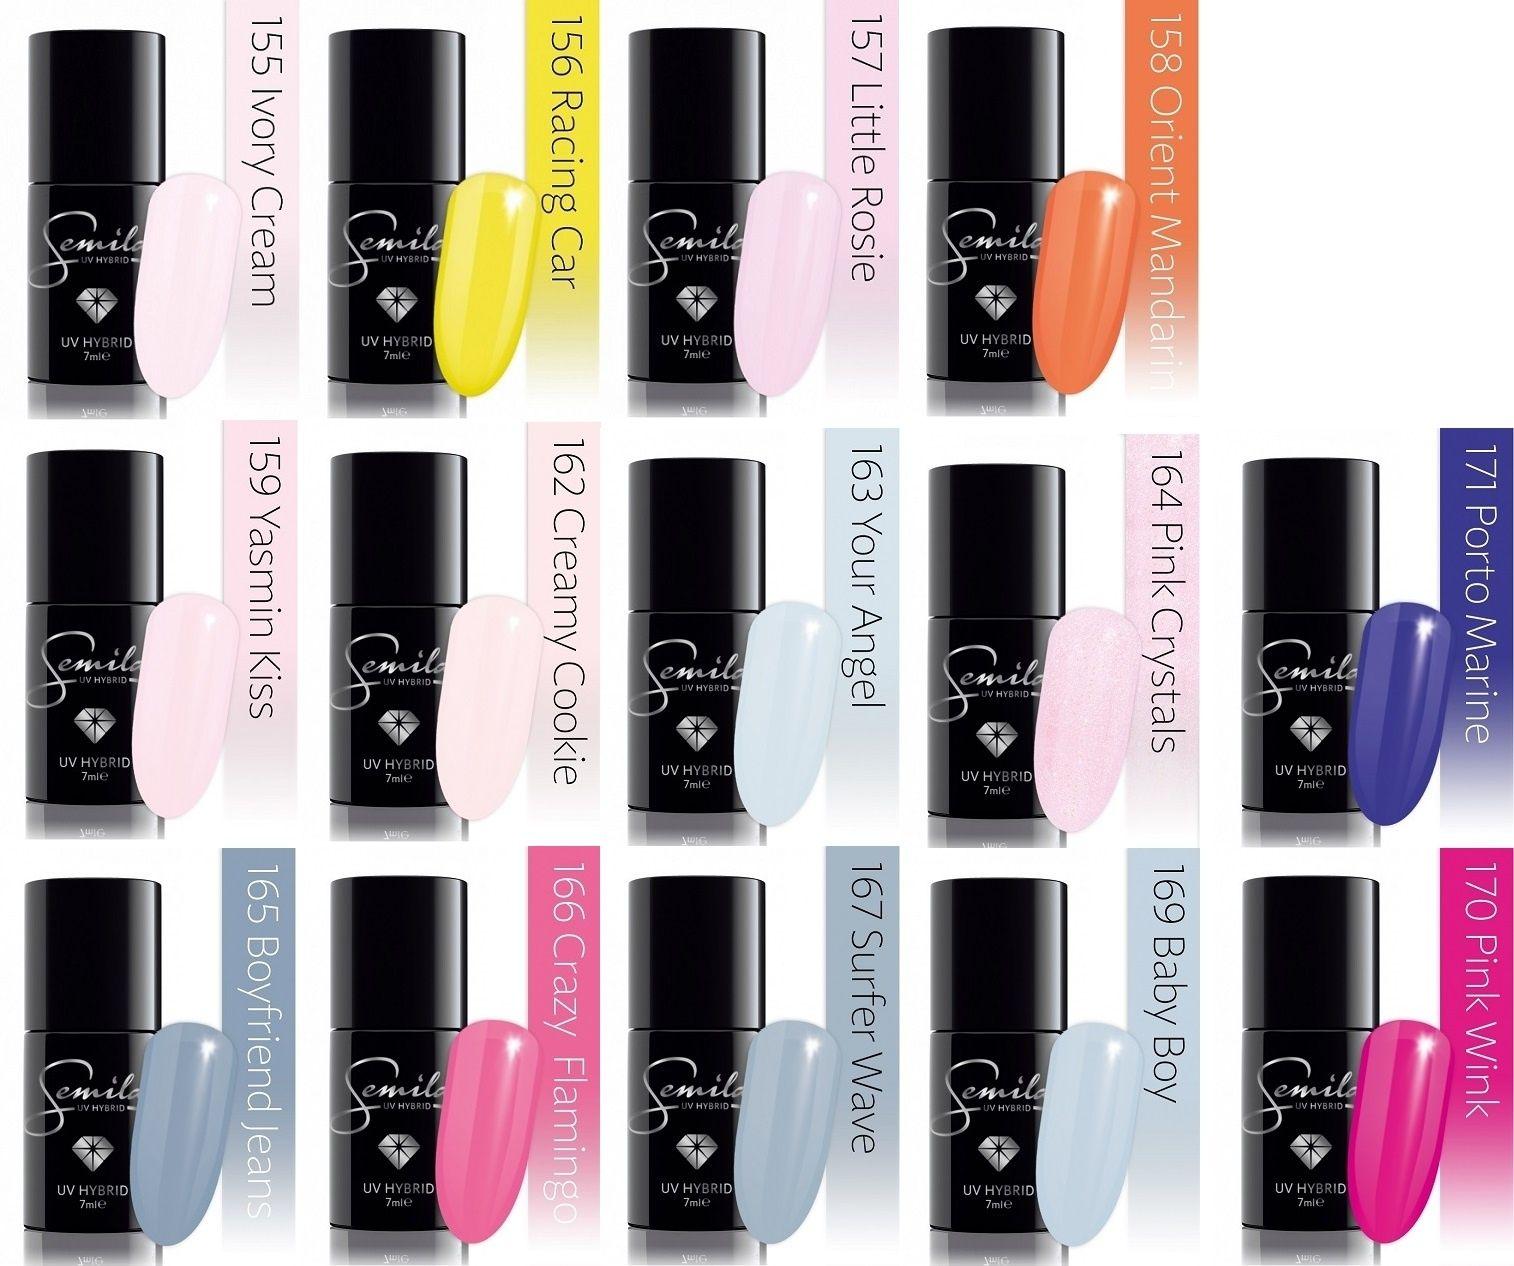 Semilac Lakiery Hybrydowe Do Lampy Uv 7ml Wyprzedaz Fun Nail Colors Manicure Nail Colors